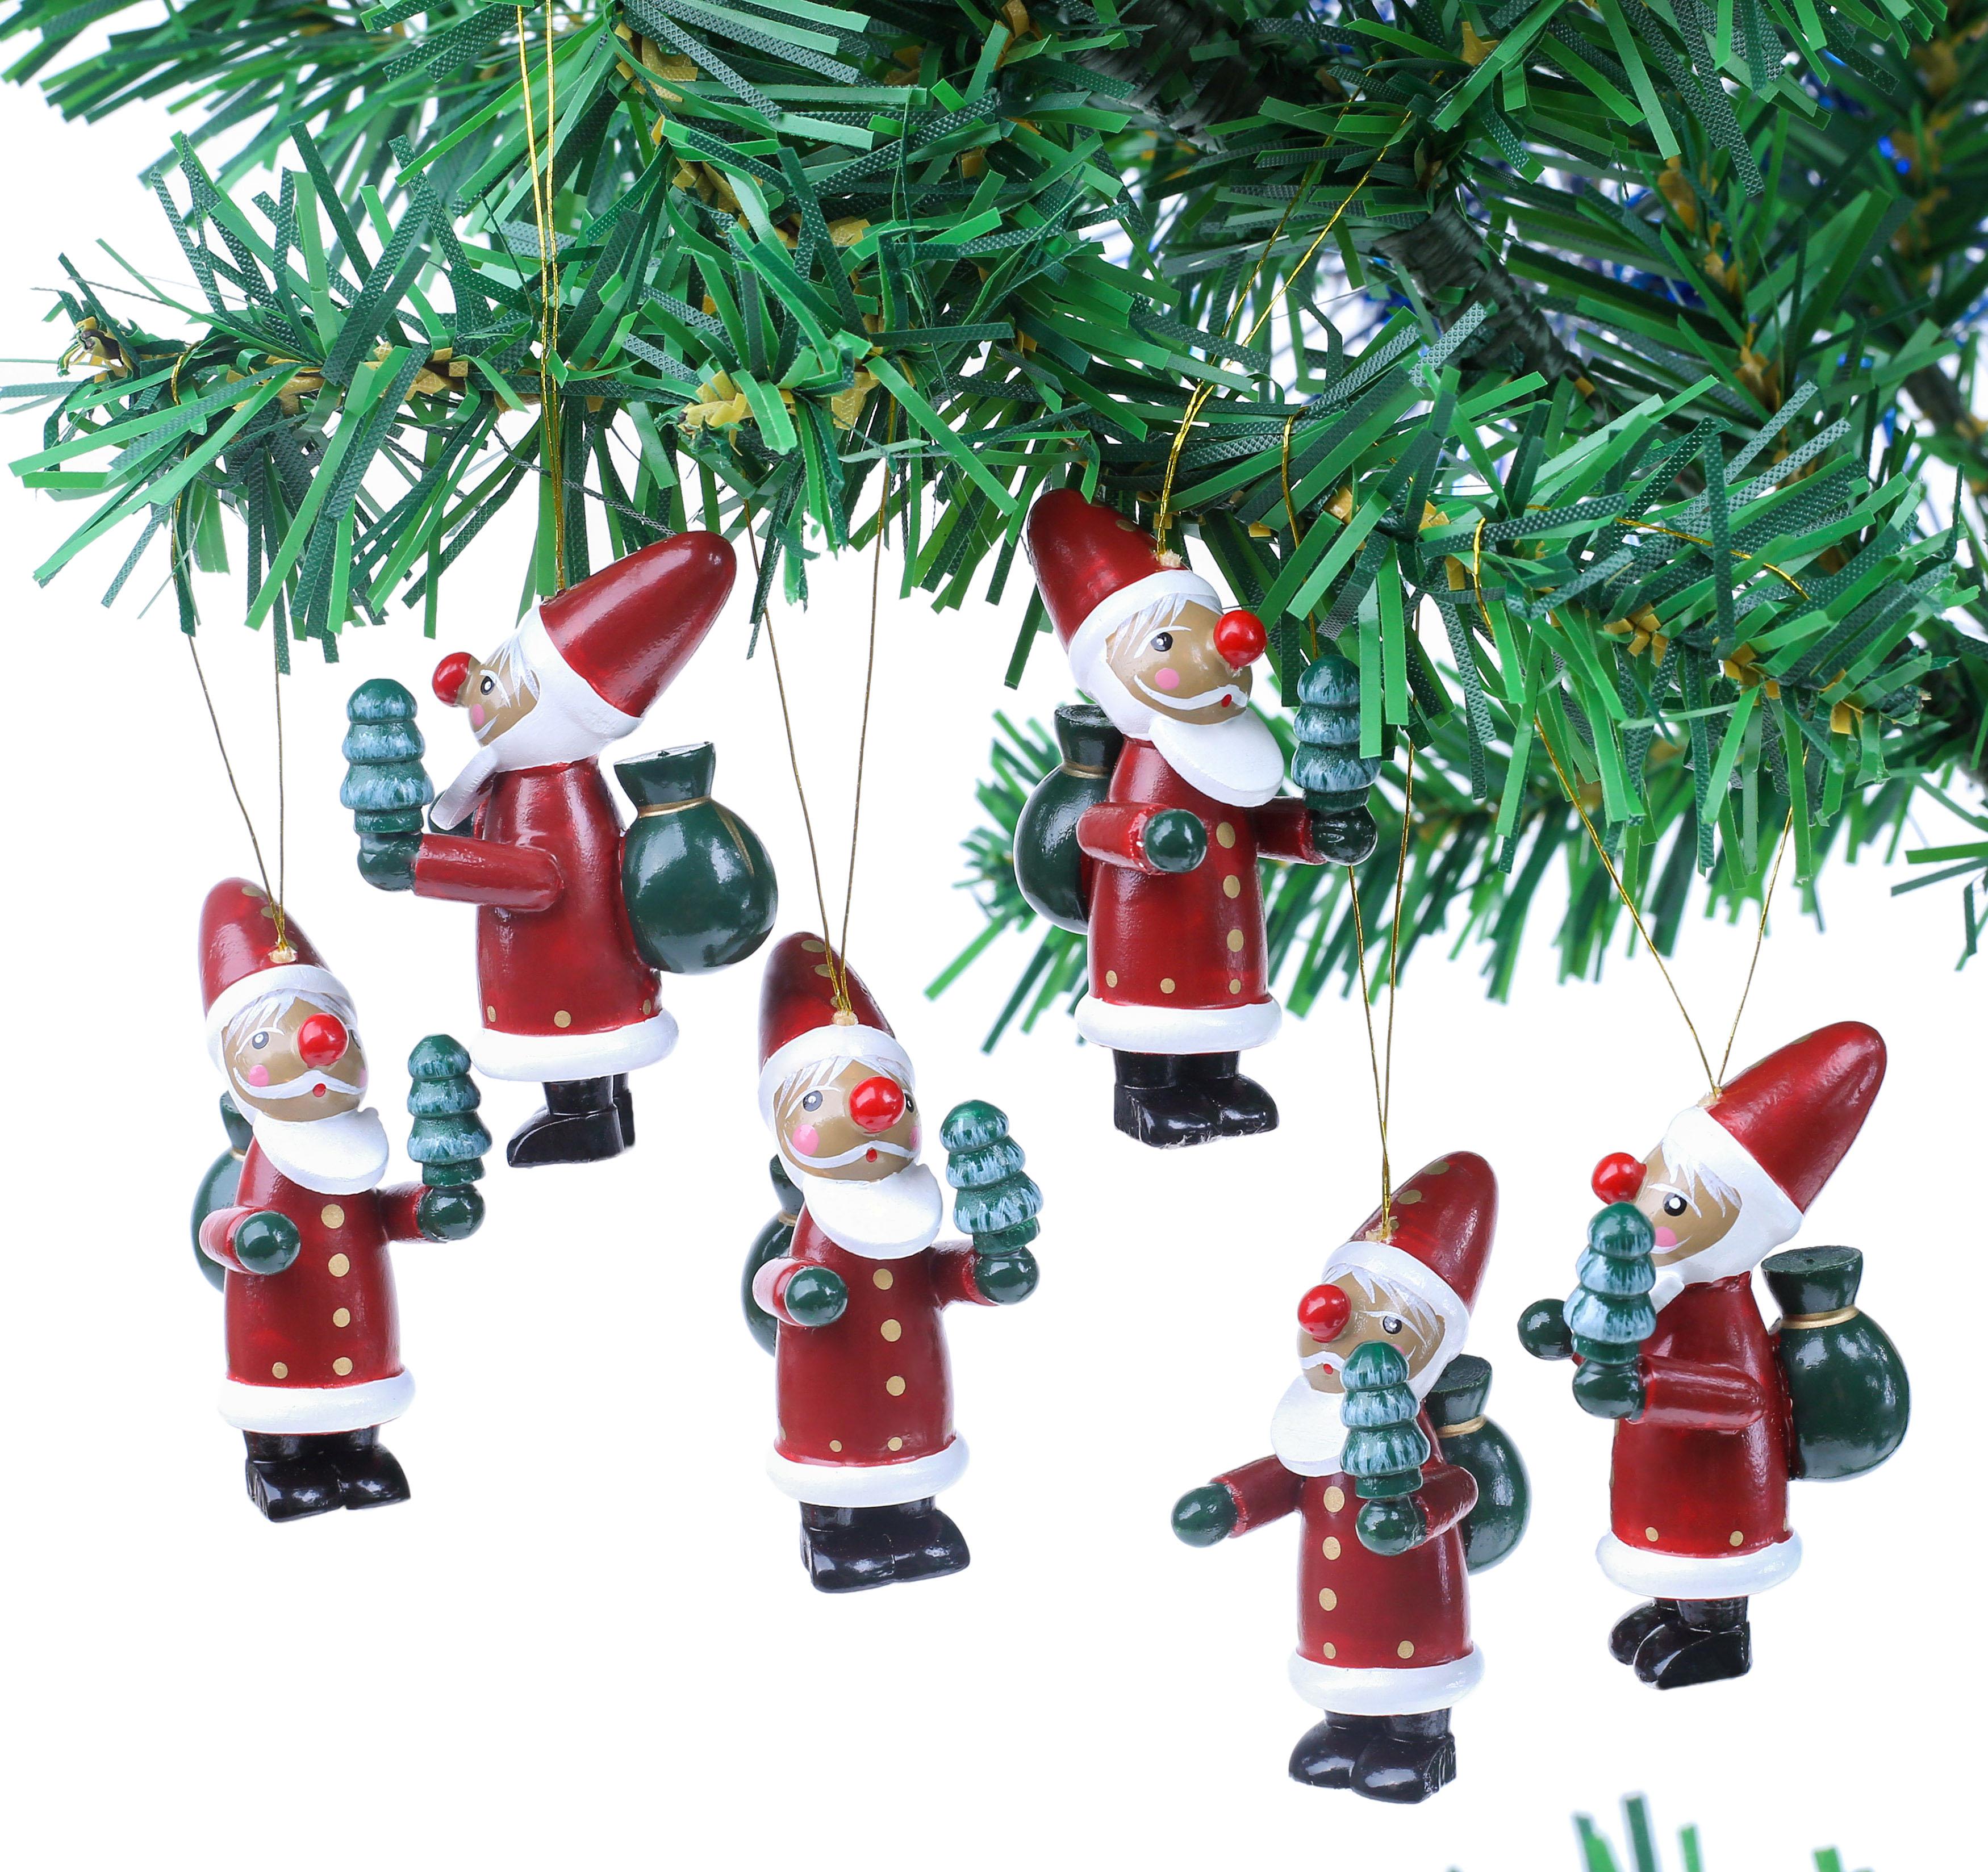 Weihnachtsbaum-Schmuck Holz Figuren Handbemalt Geschenkbox Holzanhänger 22 tlg